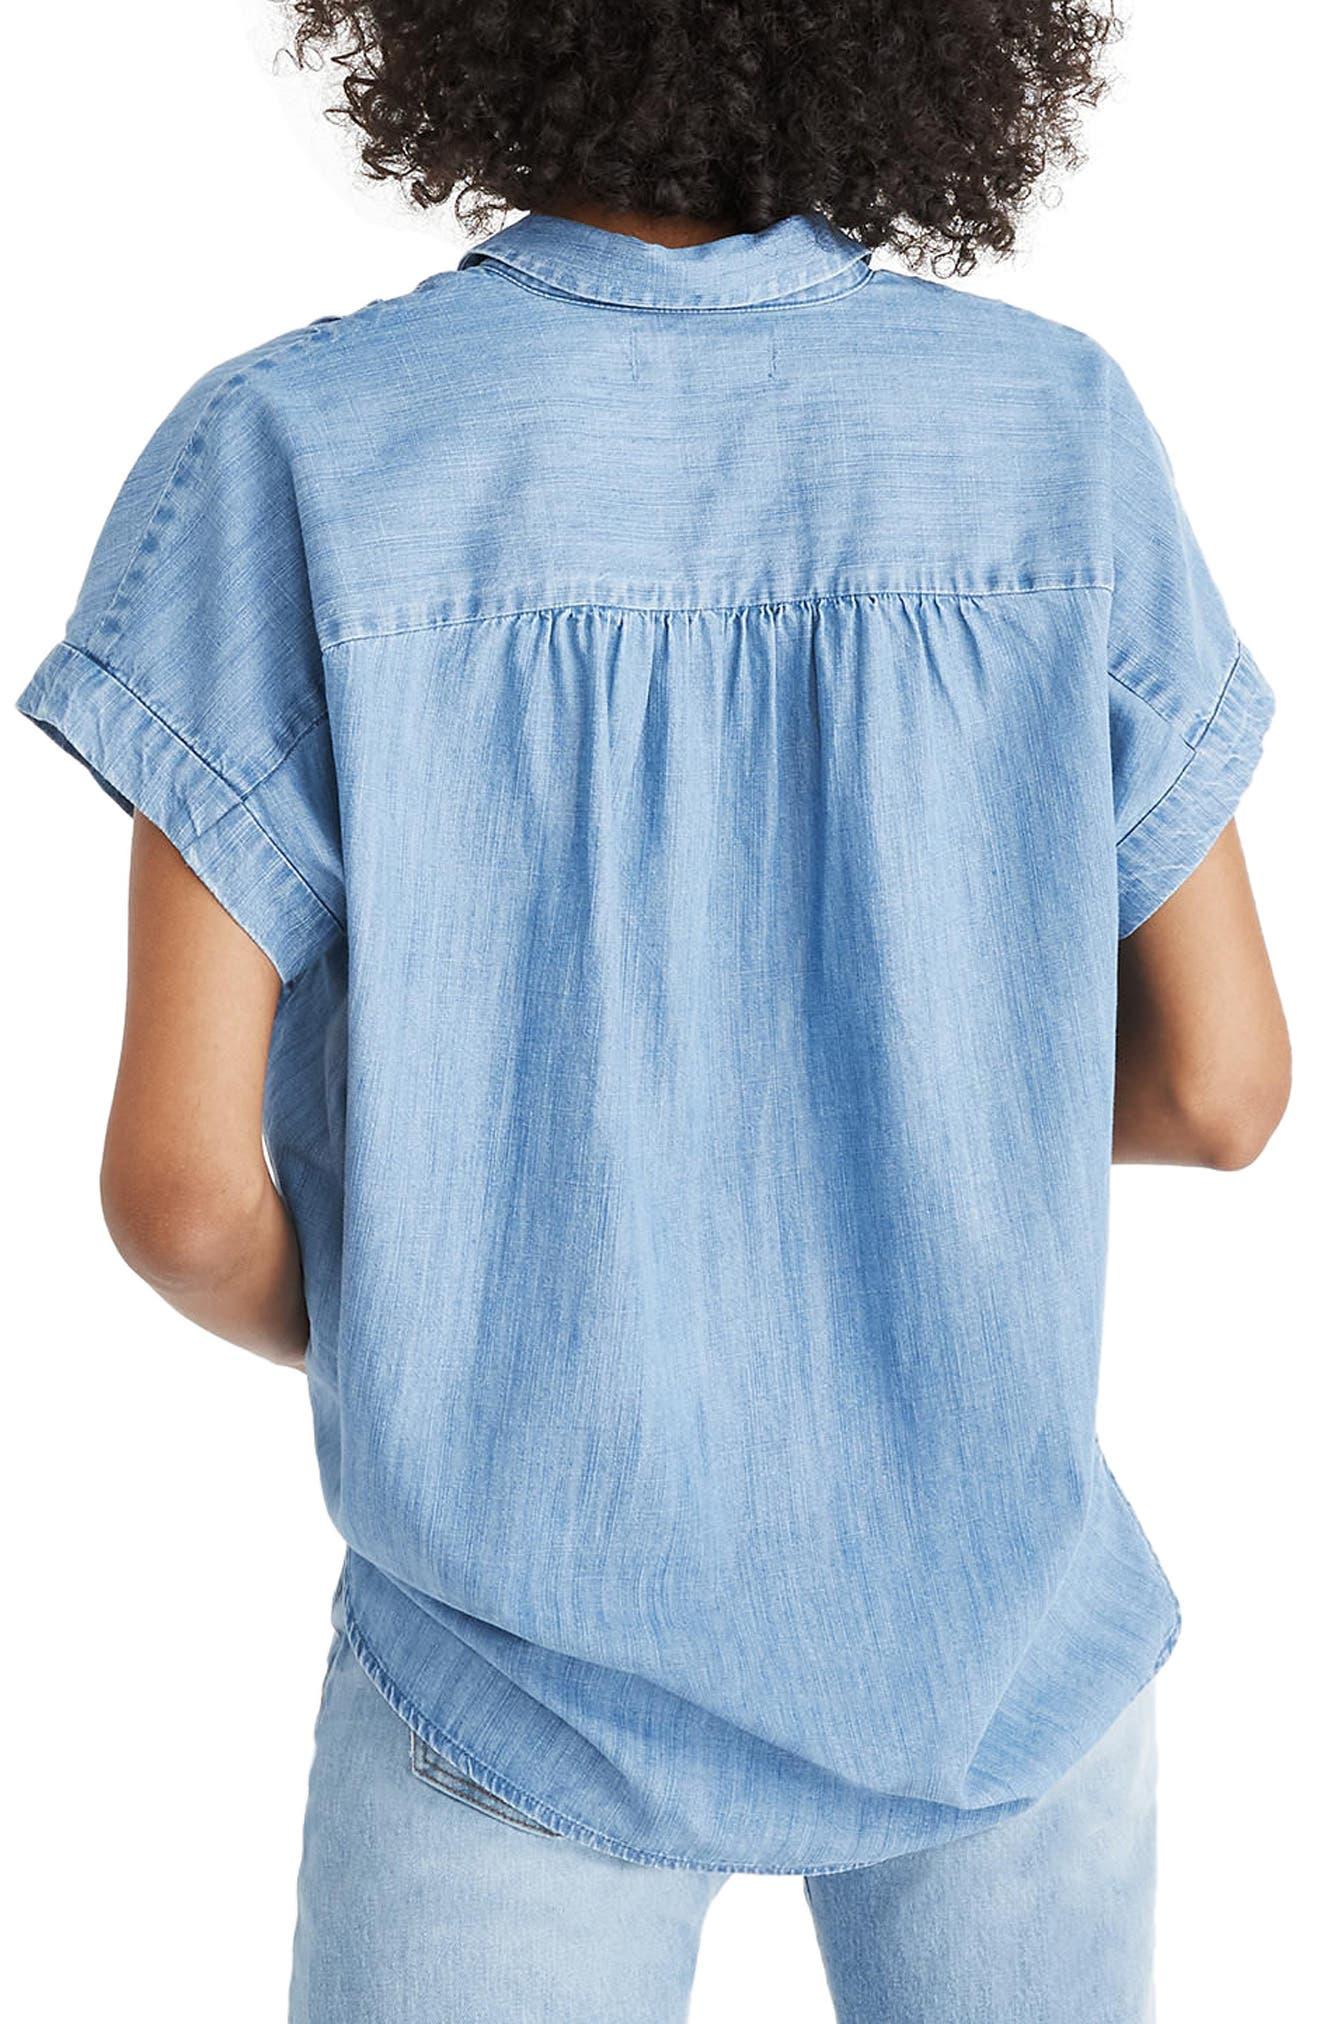 Central Chambray Shirt,                             Alternate thumbnail 2, color,                             400